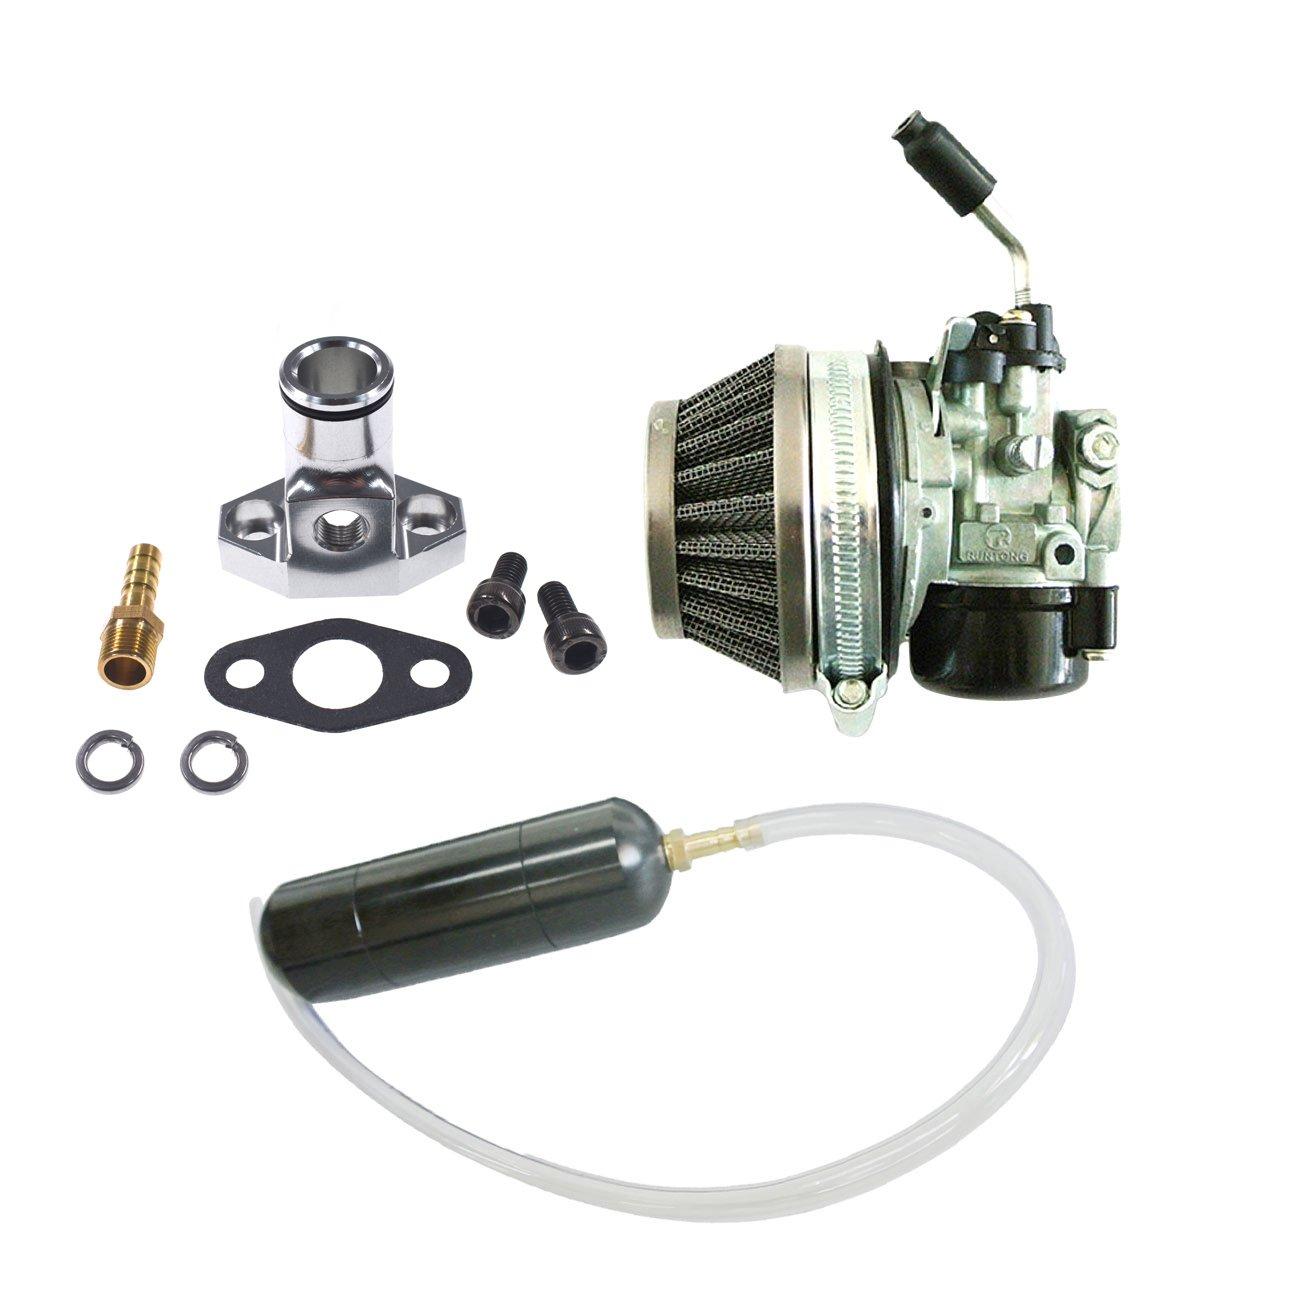 JRL Carburetor&Black Gas Power Boost Bottle For 66cc 80cc Engine Motorized Bicycle Linhai Power